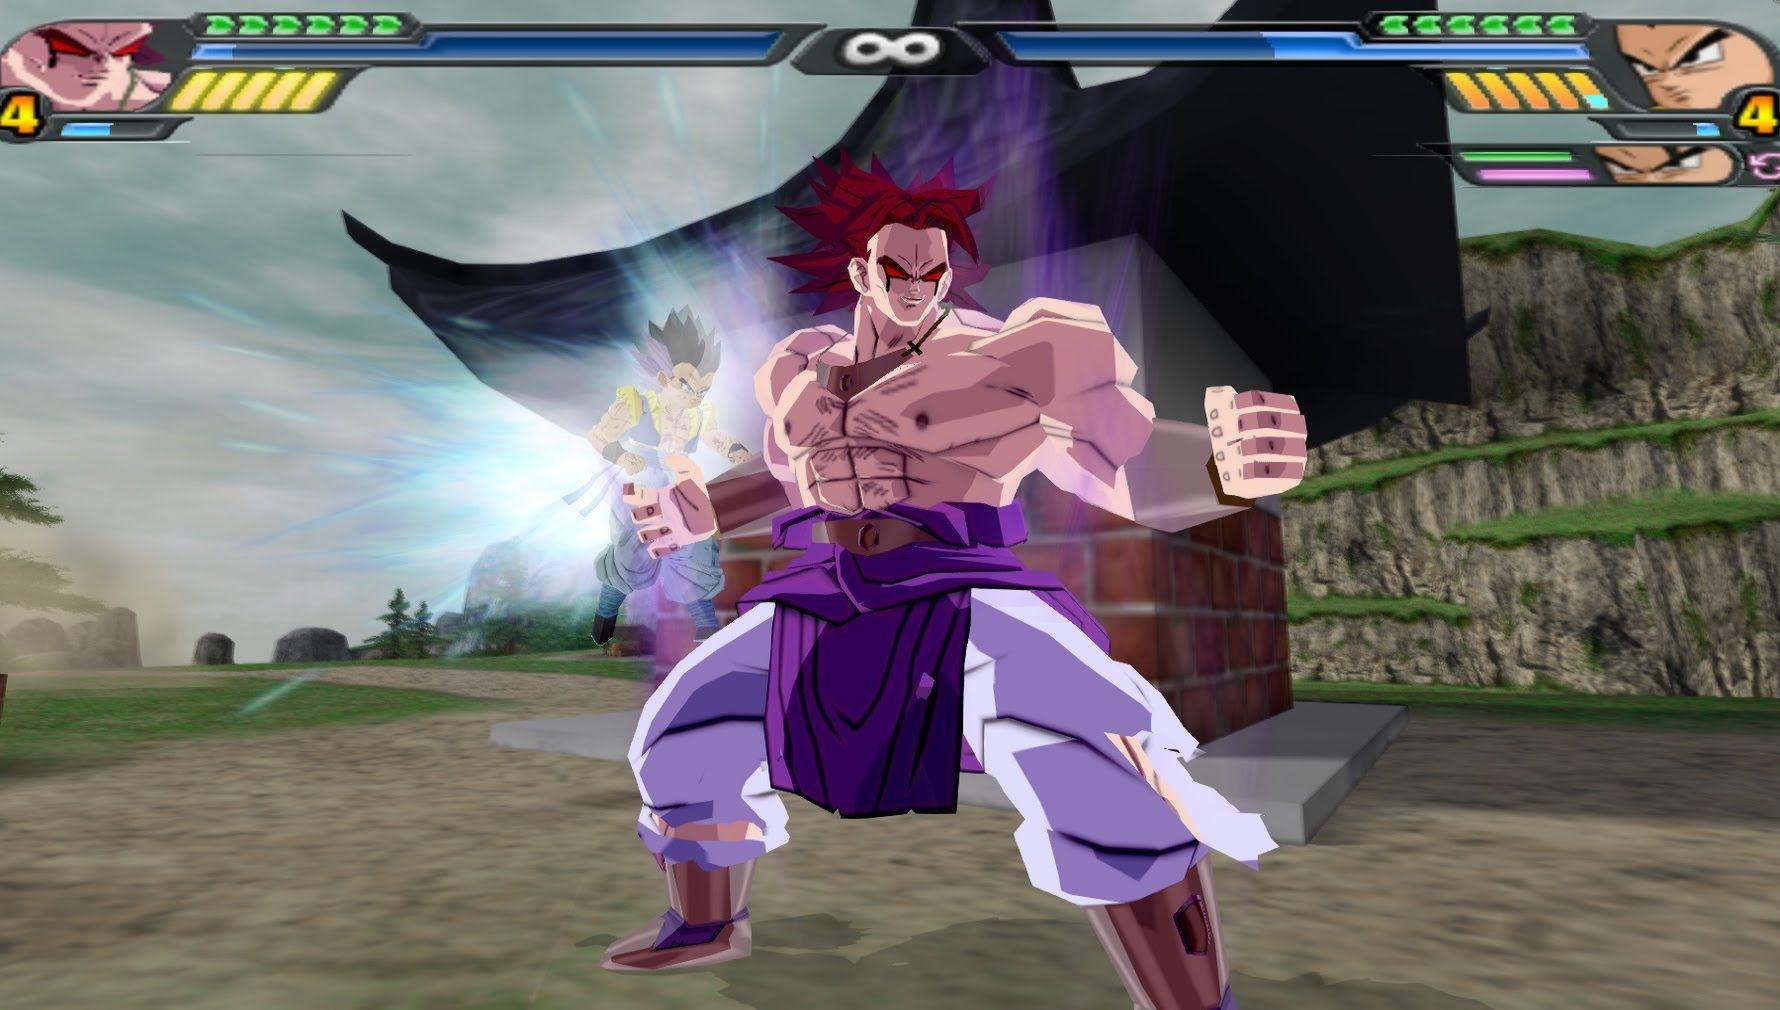 Dark Broly Dragon Ball Z Budokai Tenkaichi 3 Mod